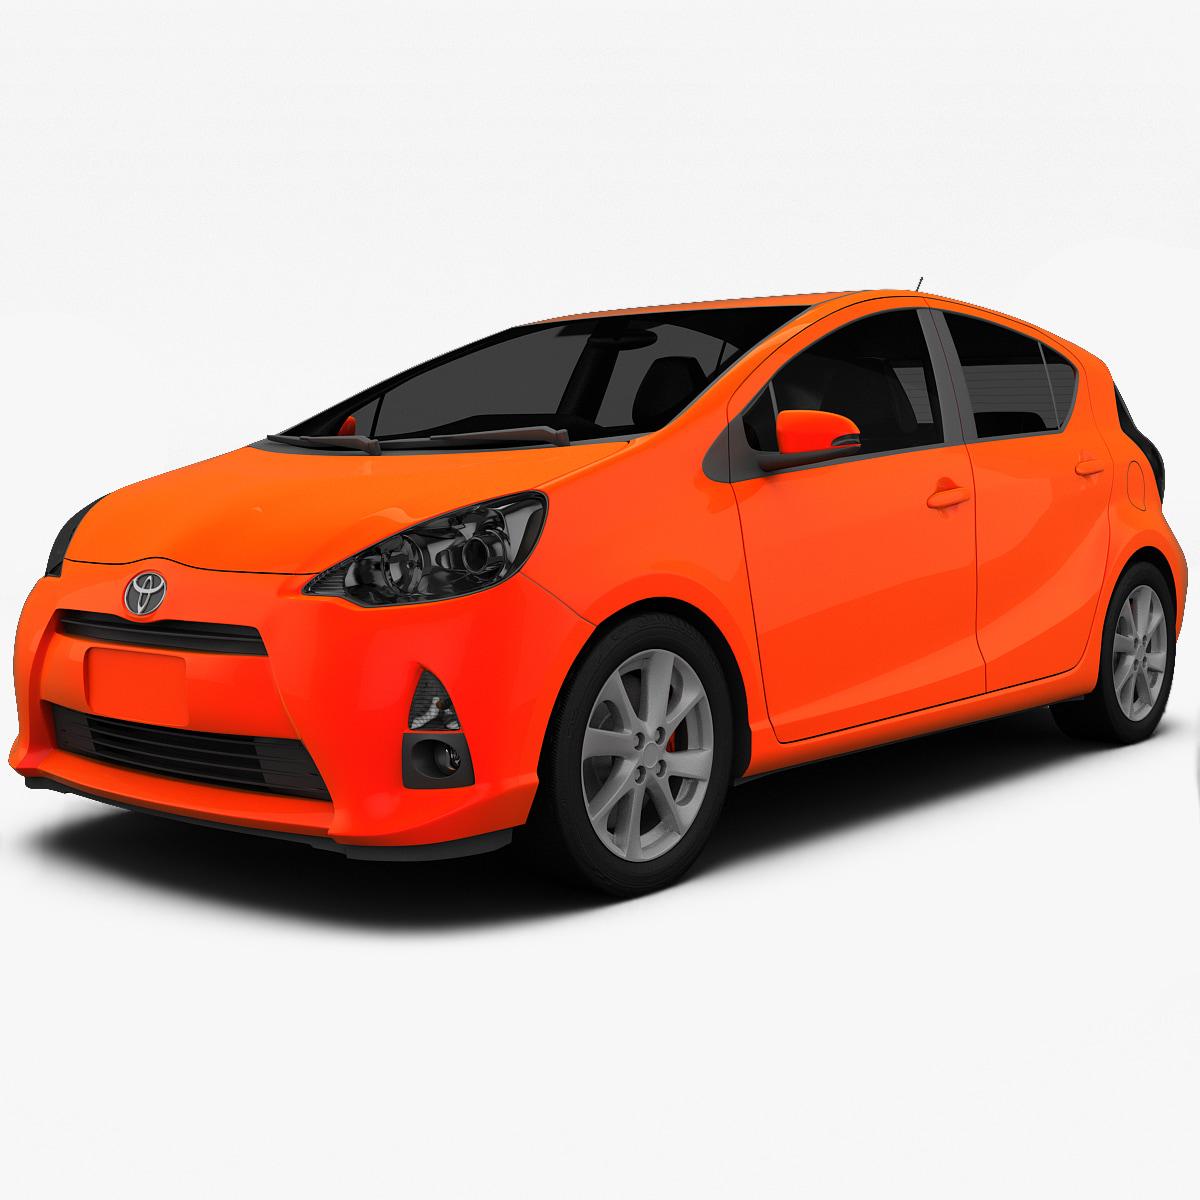 Toyota_Prius_C_2012_000.jpg